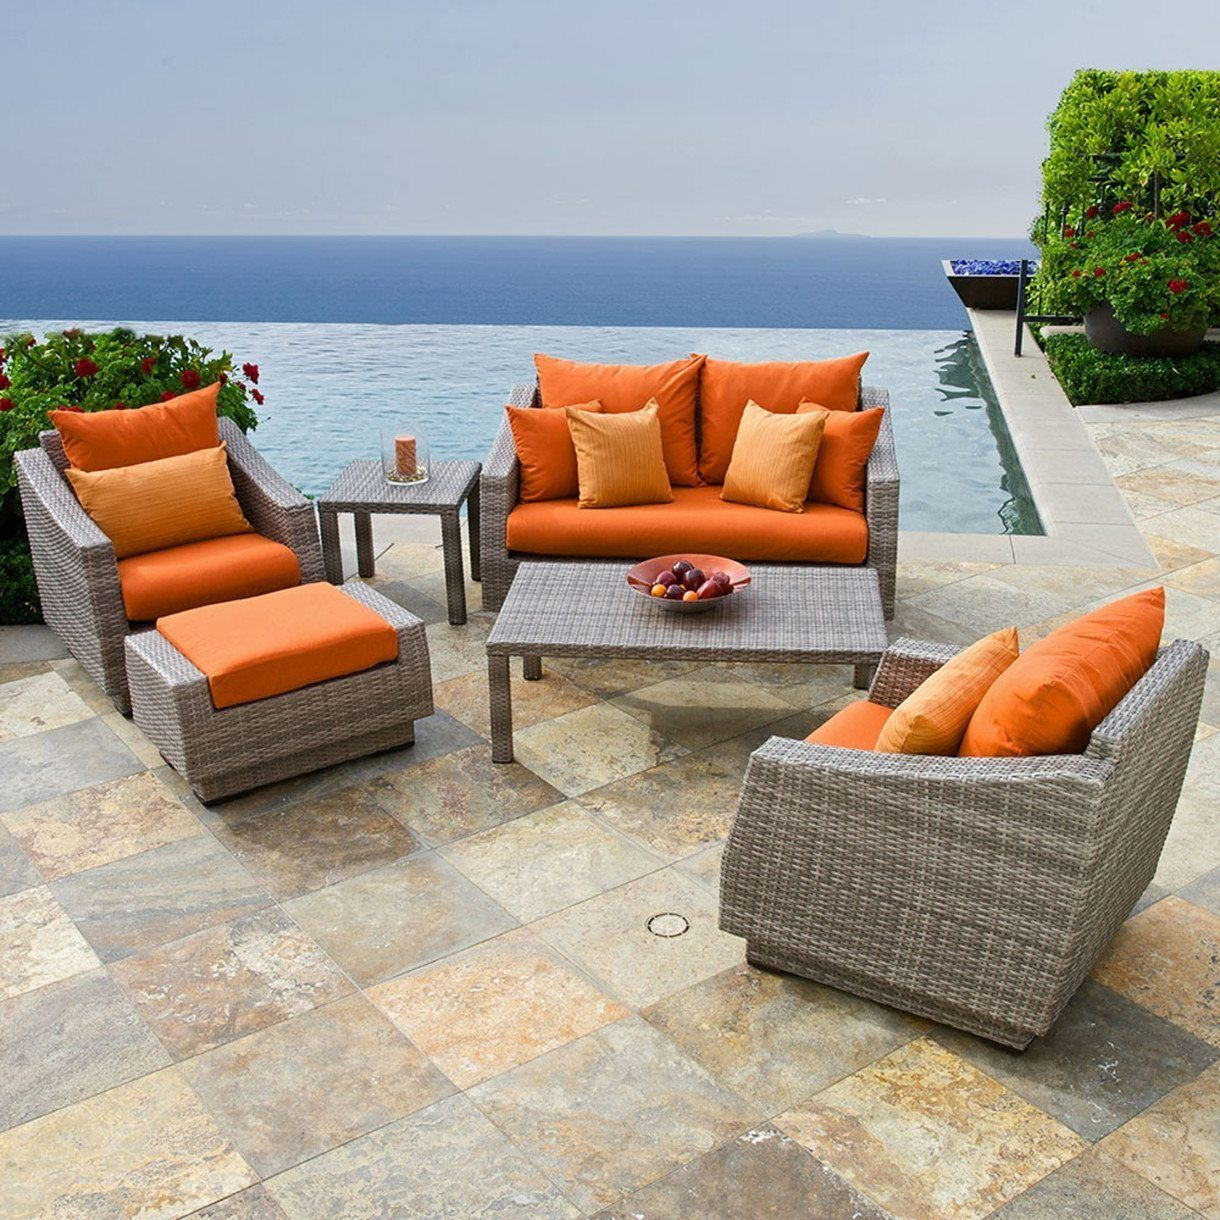 Modern outdoor patio furniture - Orange Cushions Modern Outdoor Patio Furniture